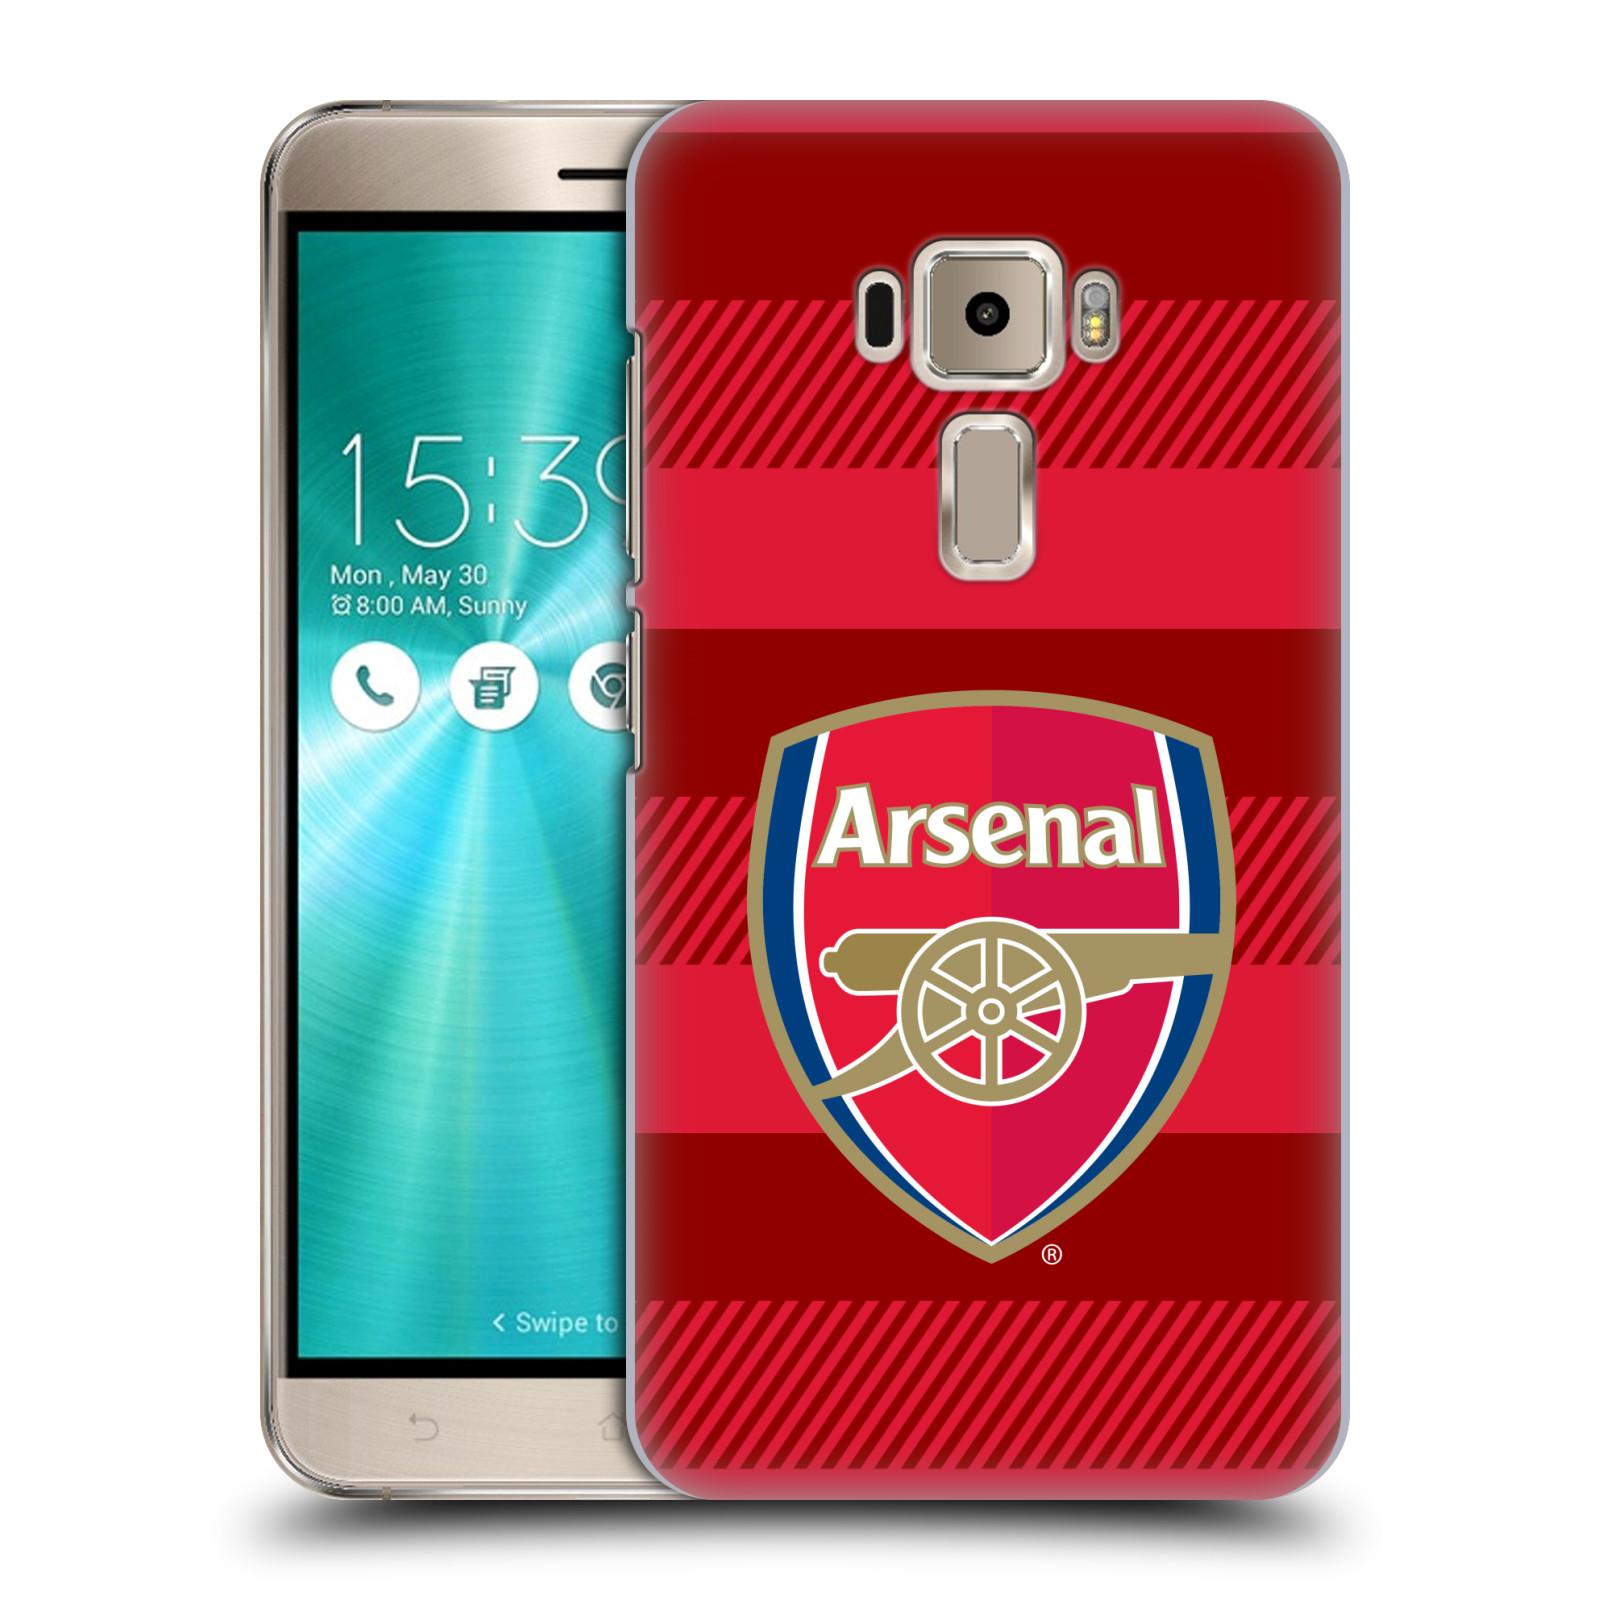 Plastové pouzdro na mobil Asus ZenFone 3 ZE520KL - Head Case - Arsenal FC - Logo s pruhy